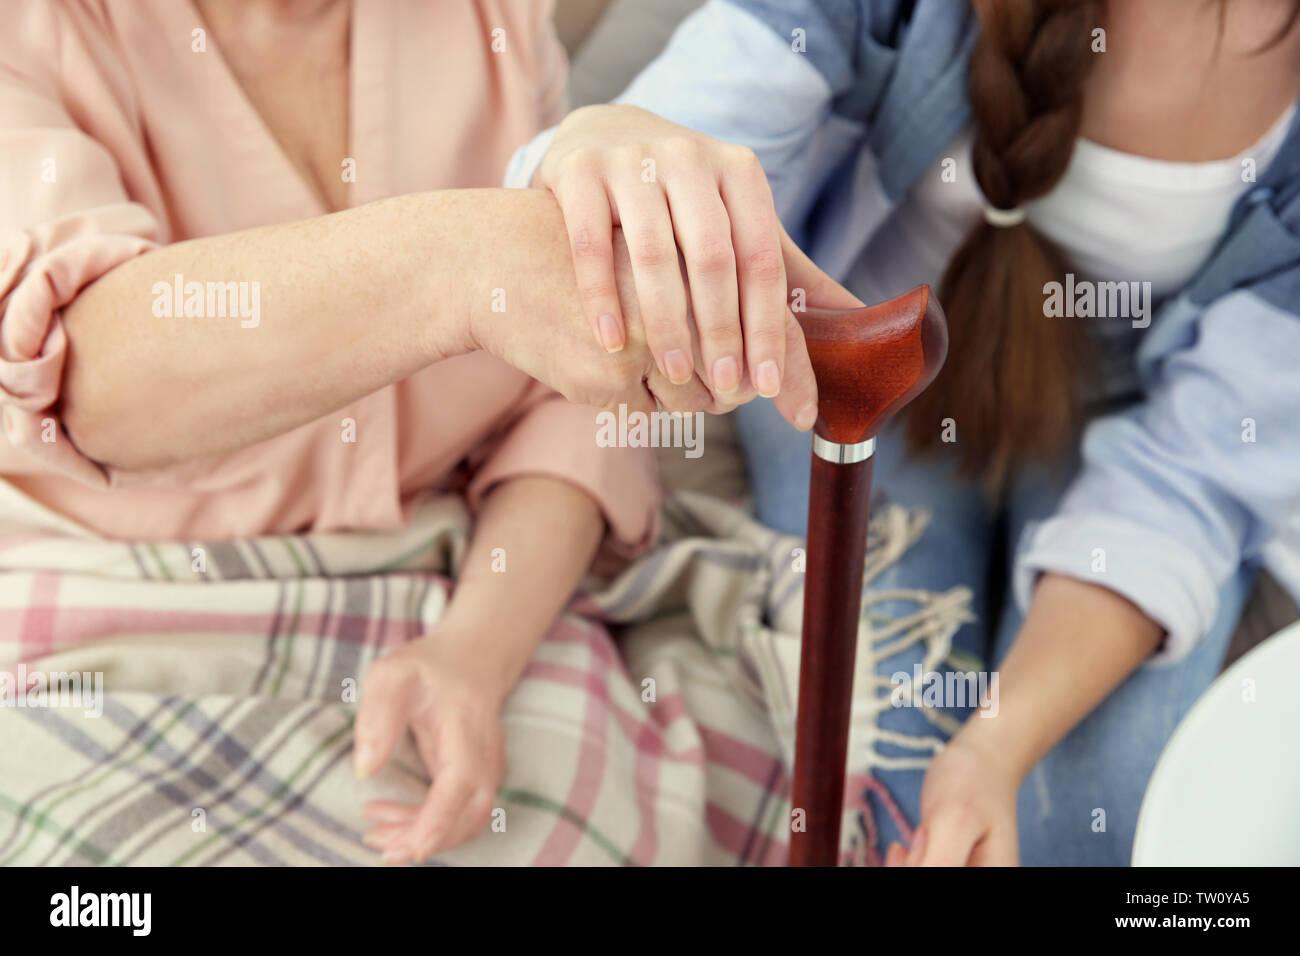 Female hands on walking stick closeup - Stock Image